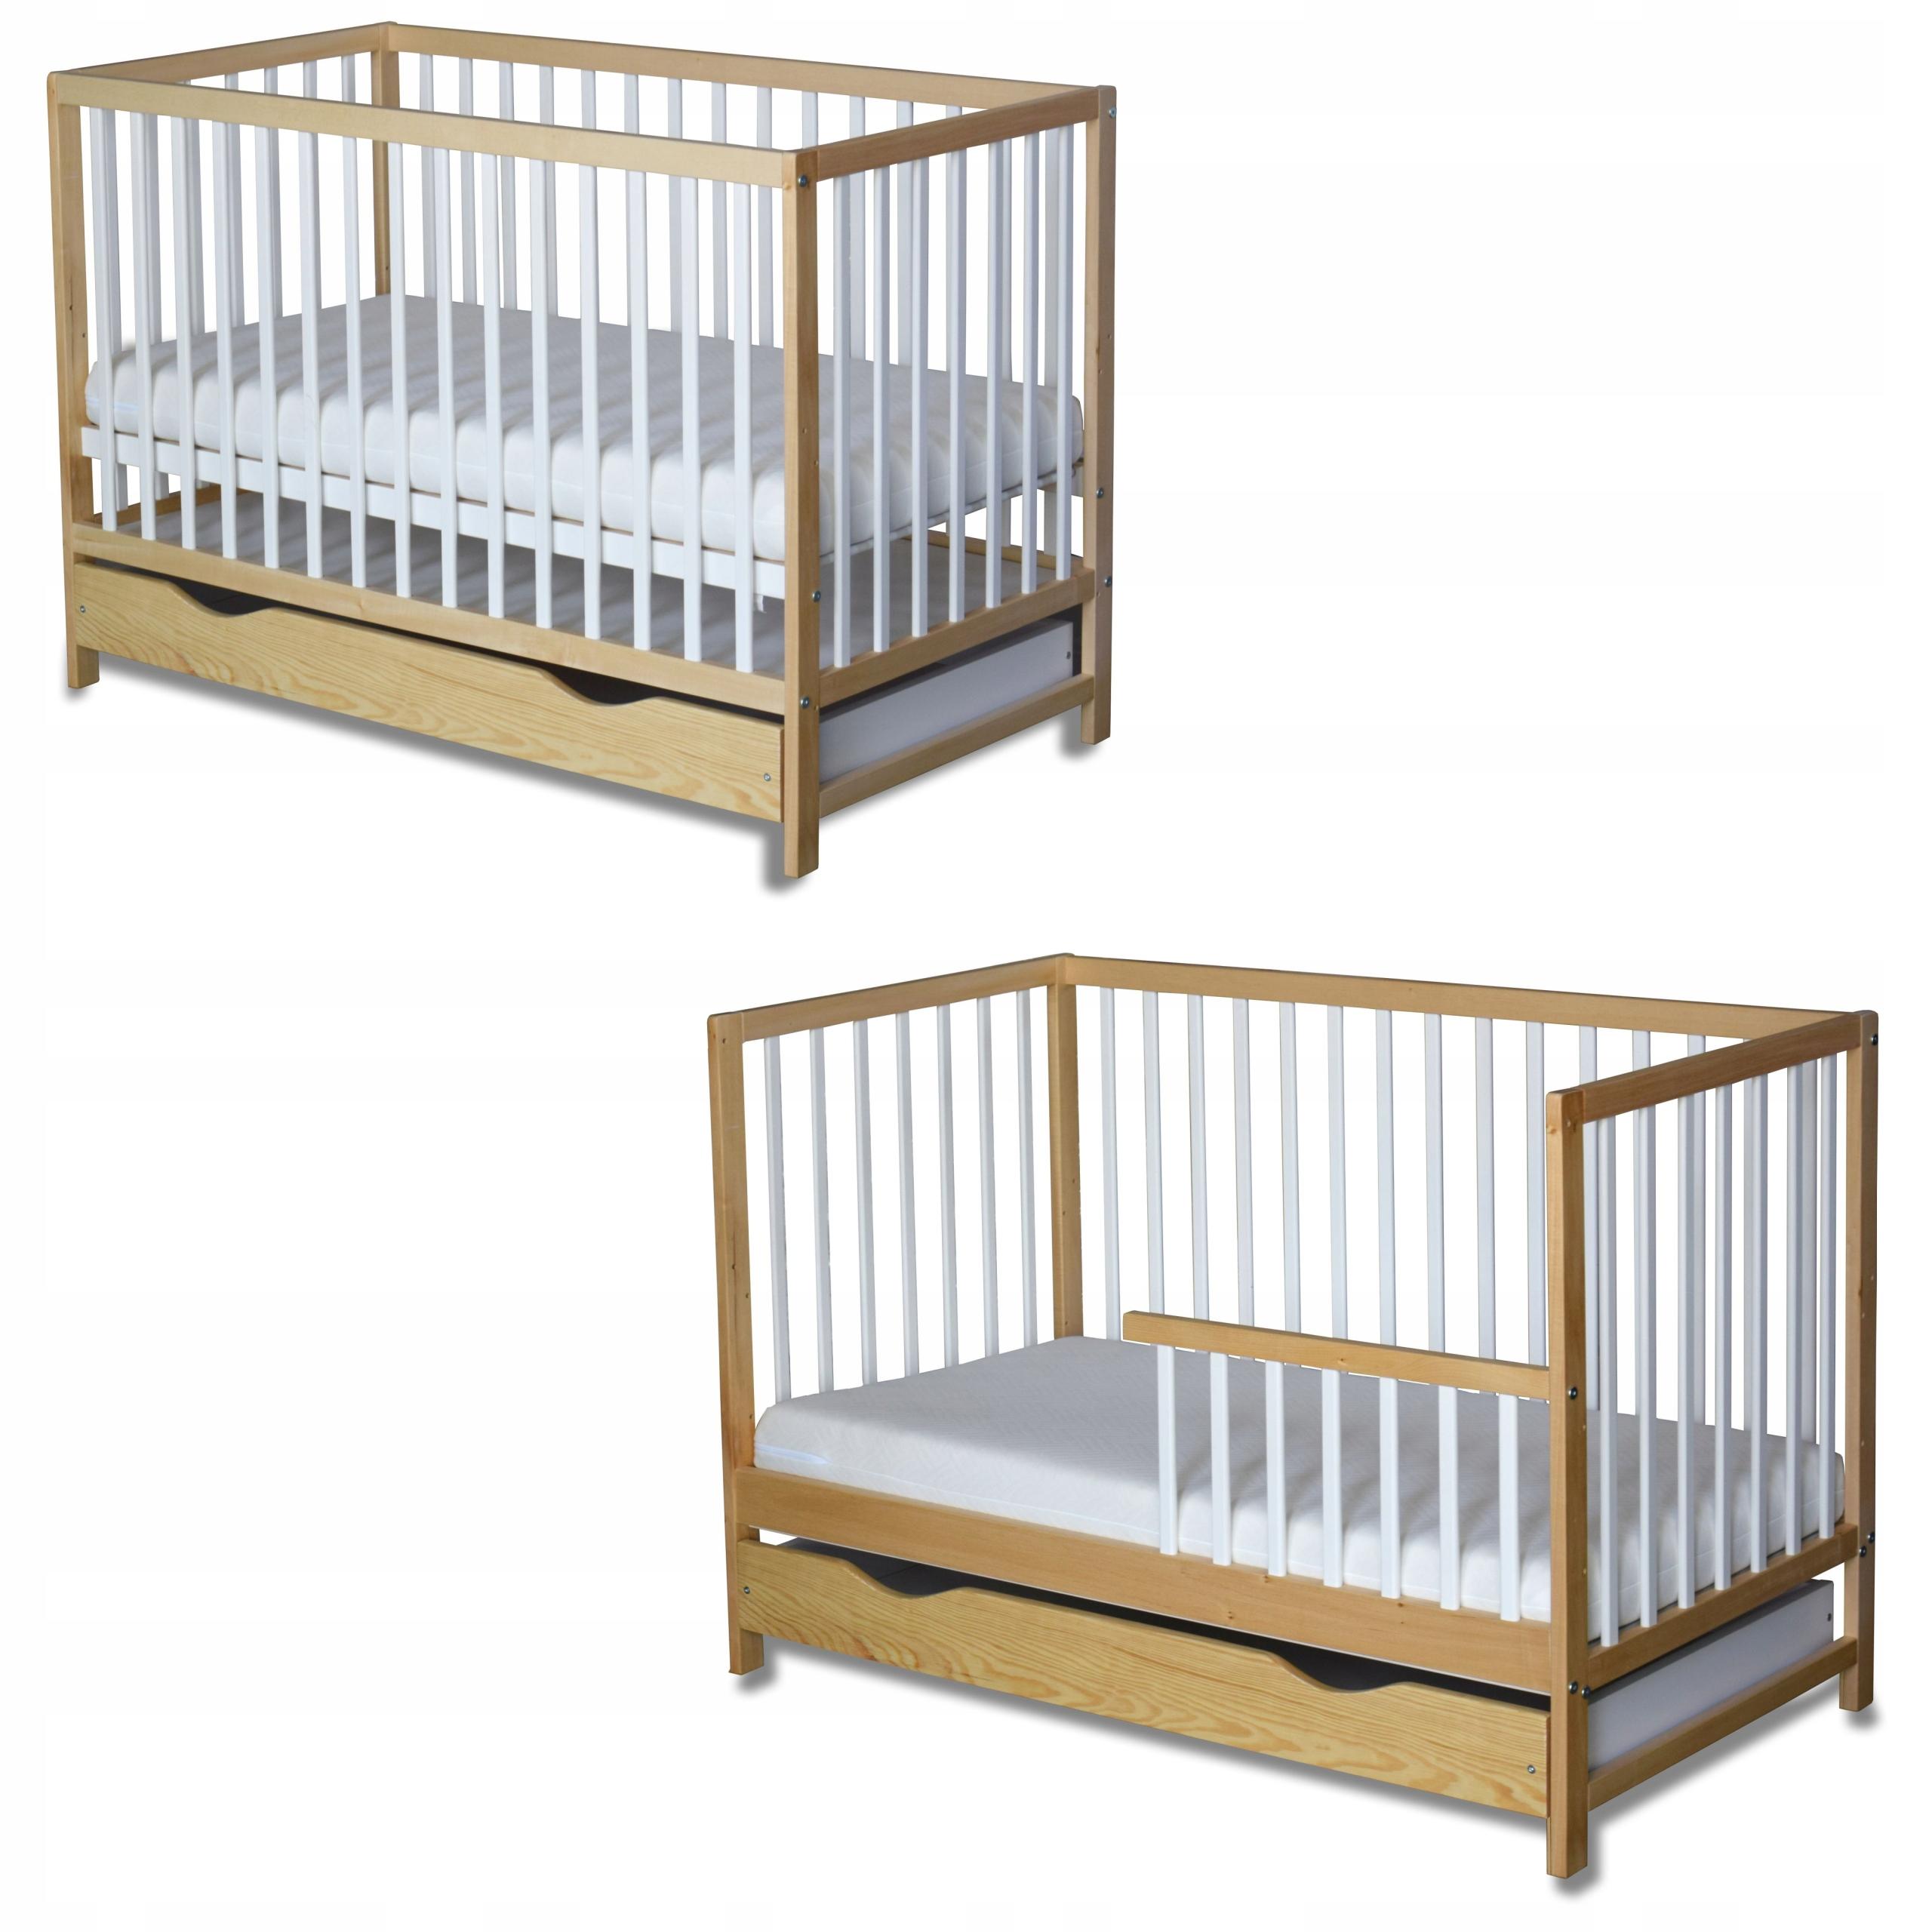 Скандинавская детская кроватка ANIA + Barrier + Drawer